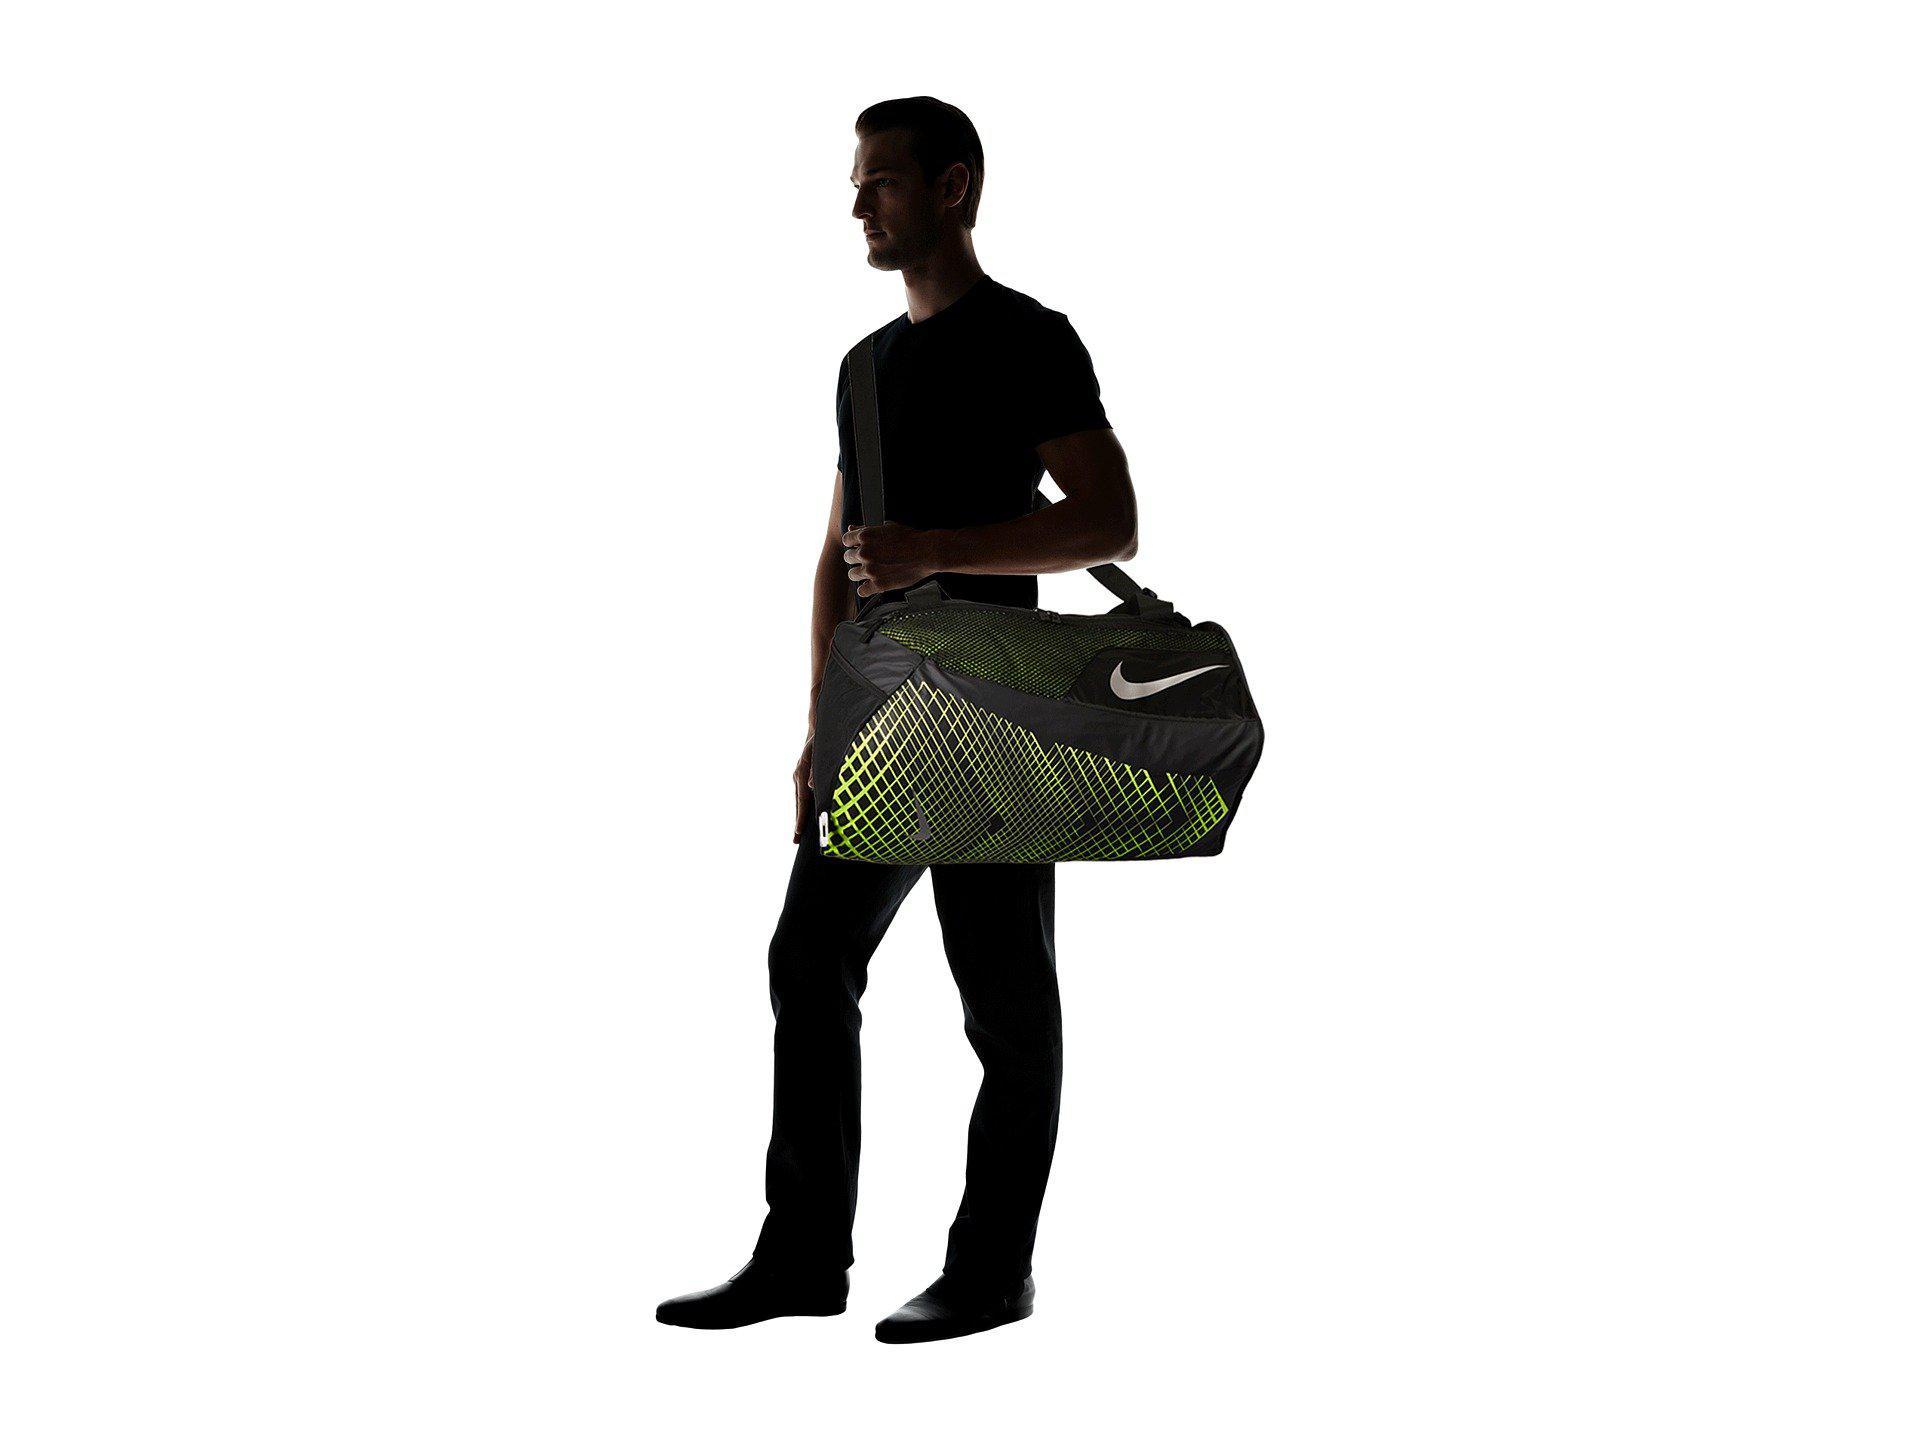 b977bf3a8b29 Nike - Multicolor Vapor Max Air Training Medium Duffel Bag  (black volt metallic. View fullscreen